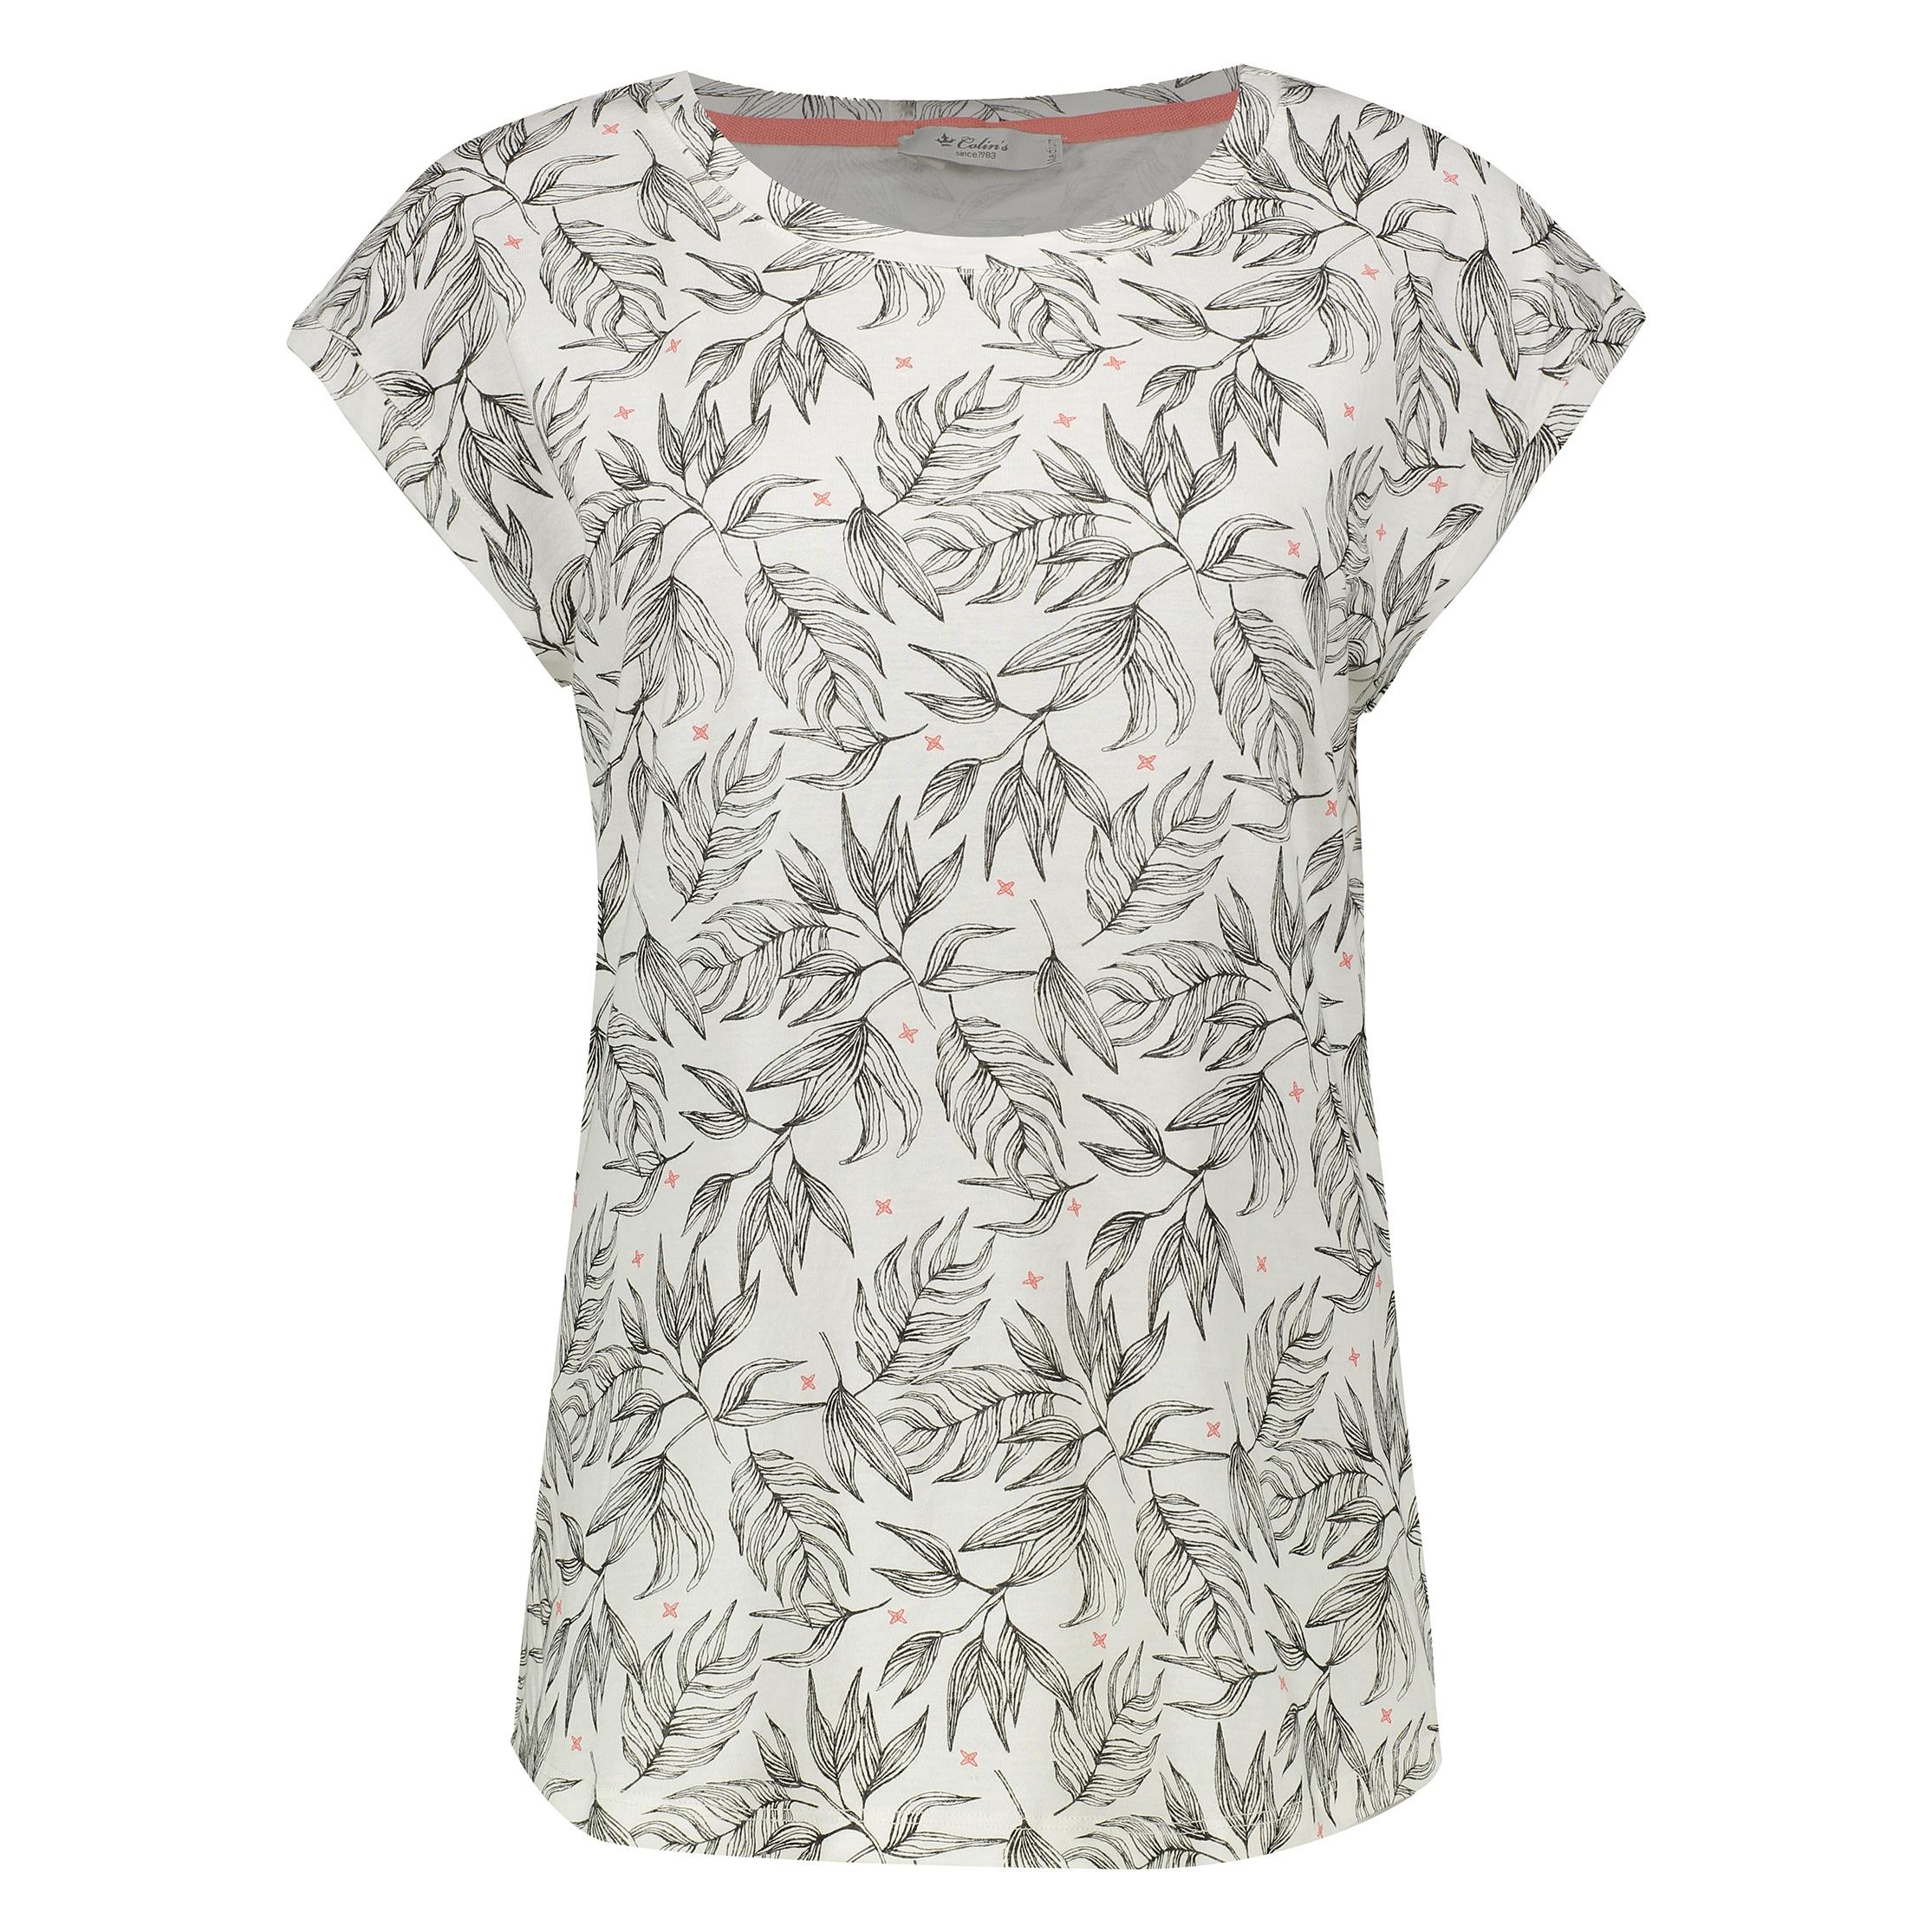 تصویر تی شرت زنانه کالینز مدل  CL1032905-OFF WHITE